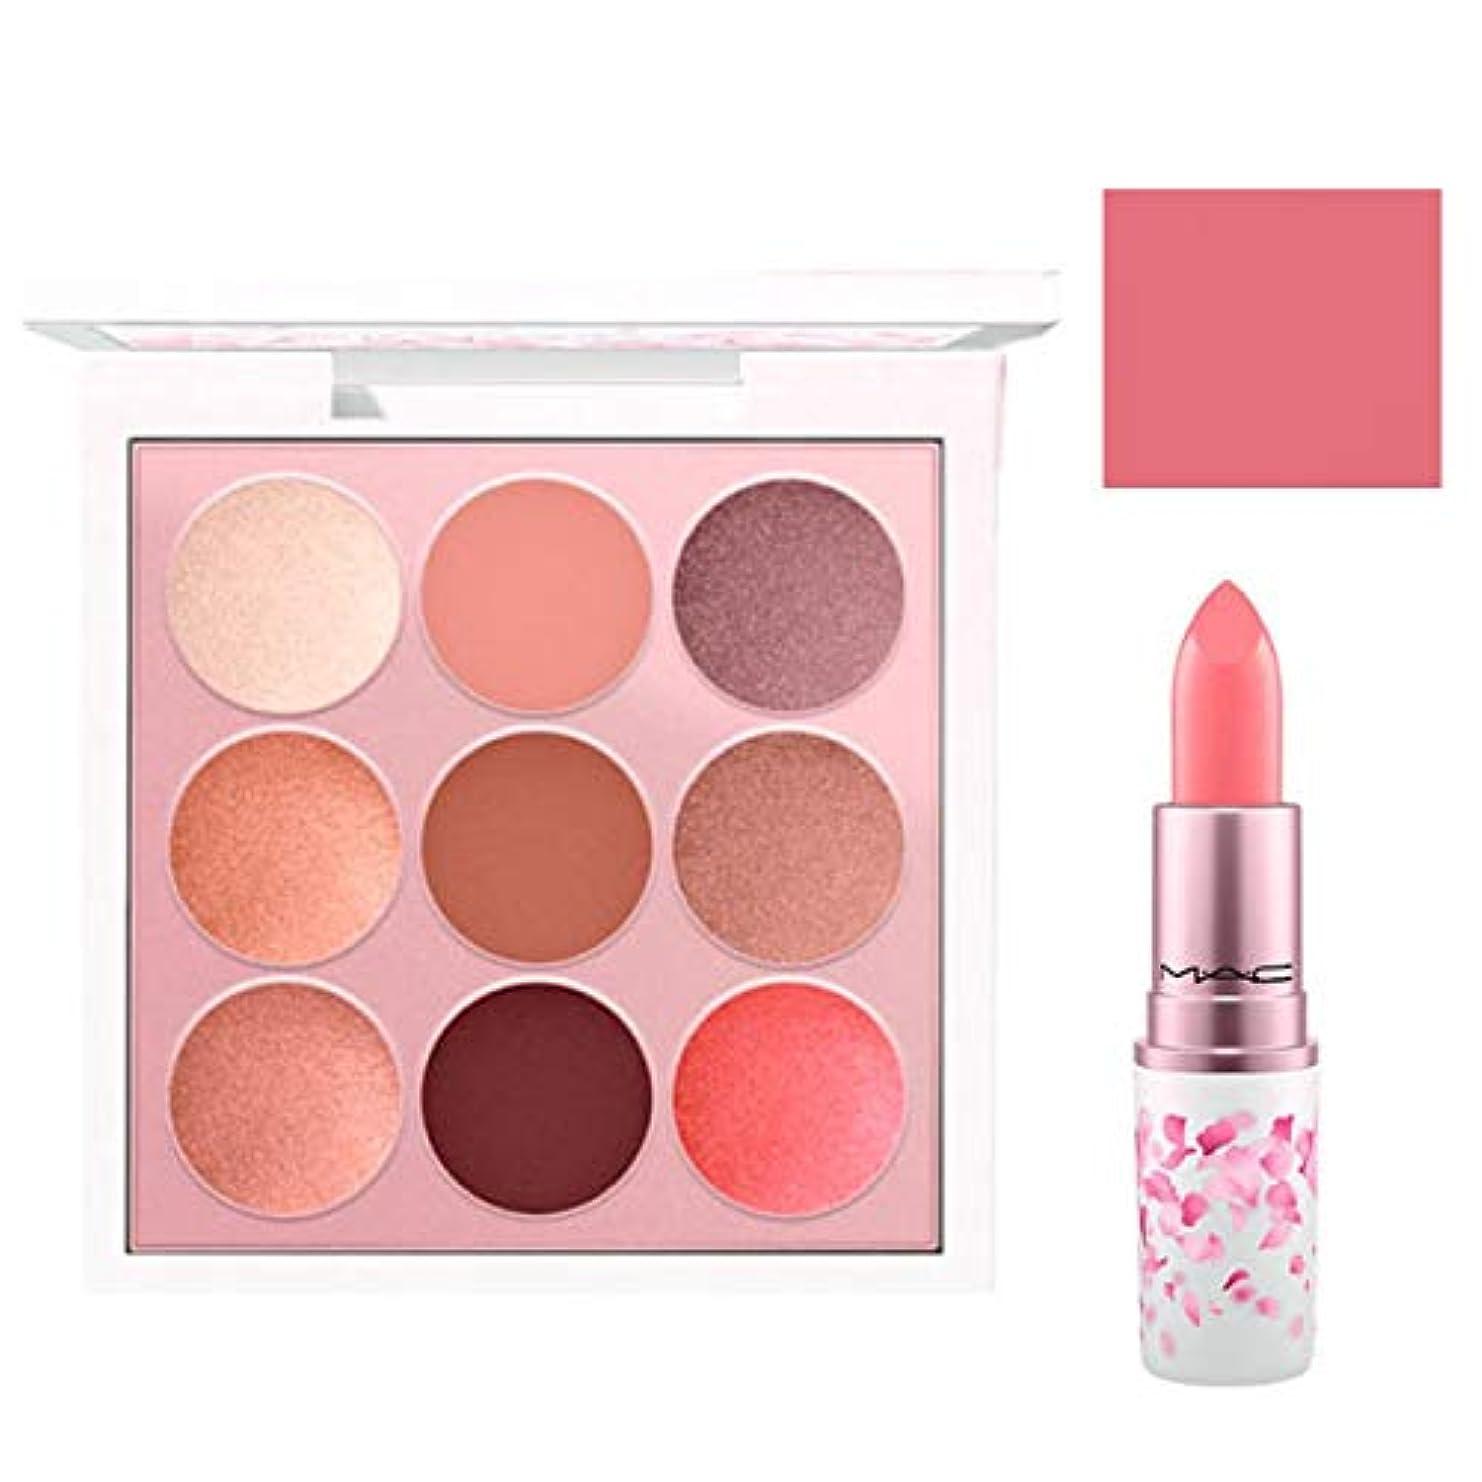 中間無関心潜水艦M.A.C 限定版, Boom, Boom, Bloom EyeShadow & Lipstick (Kabuki Doll Palette & Hi-Fructease) [海外直送品] [並行輸入品]